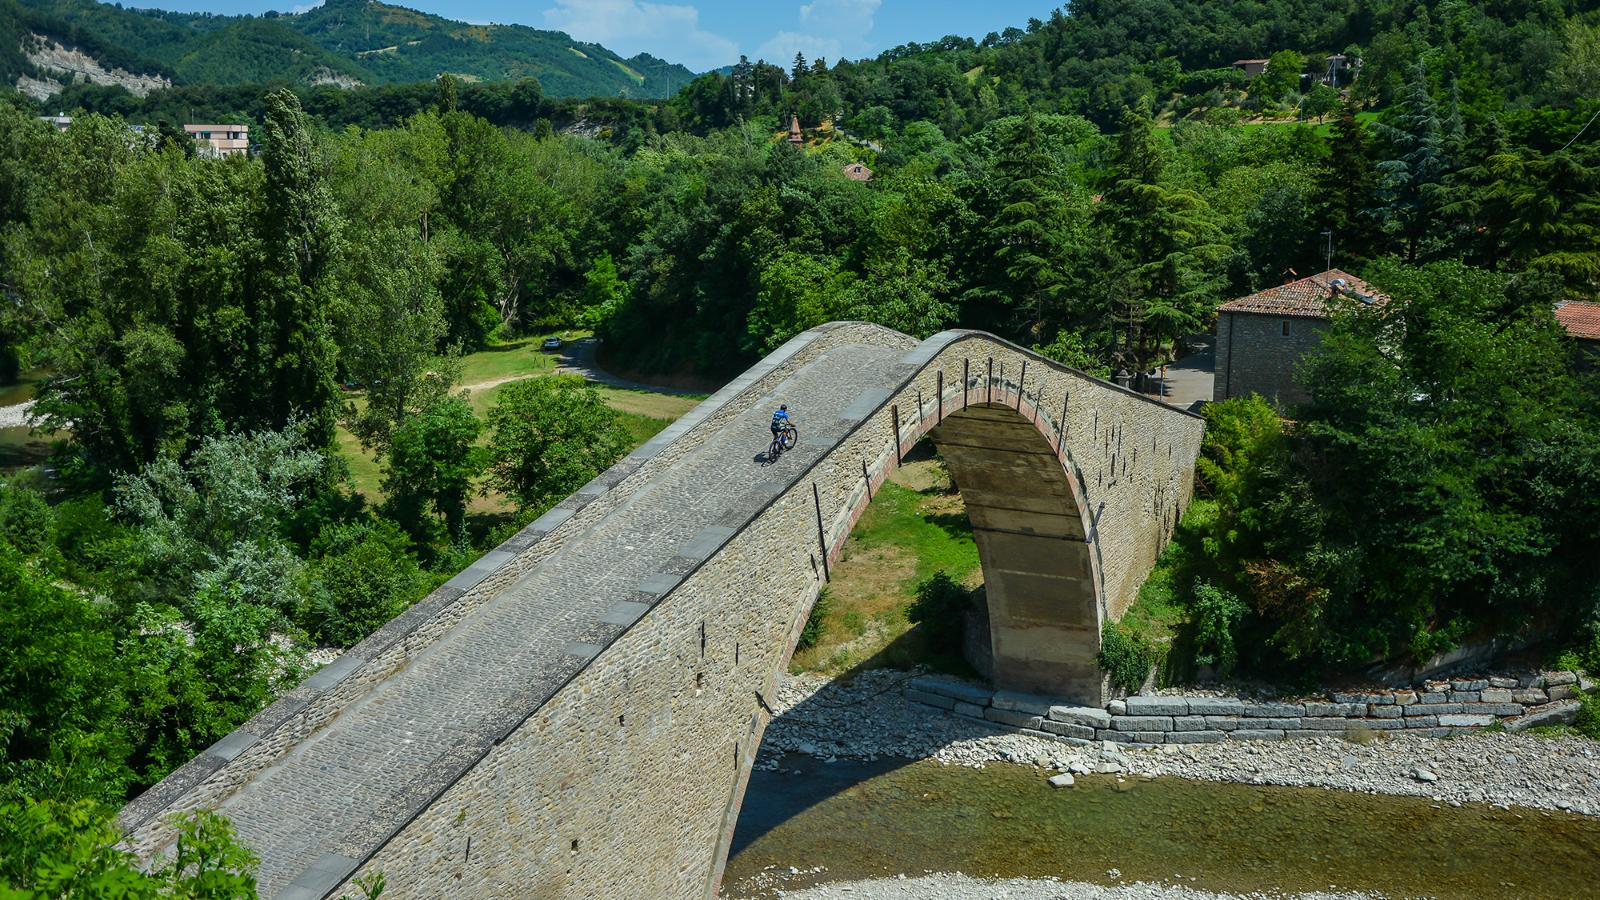 The Santerno valley